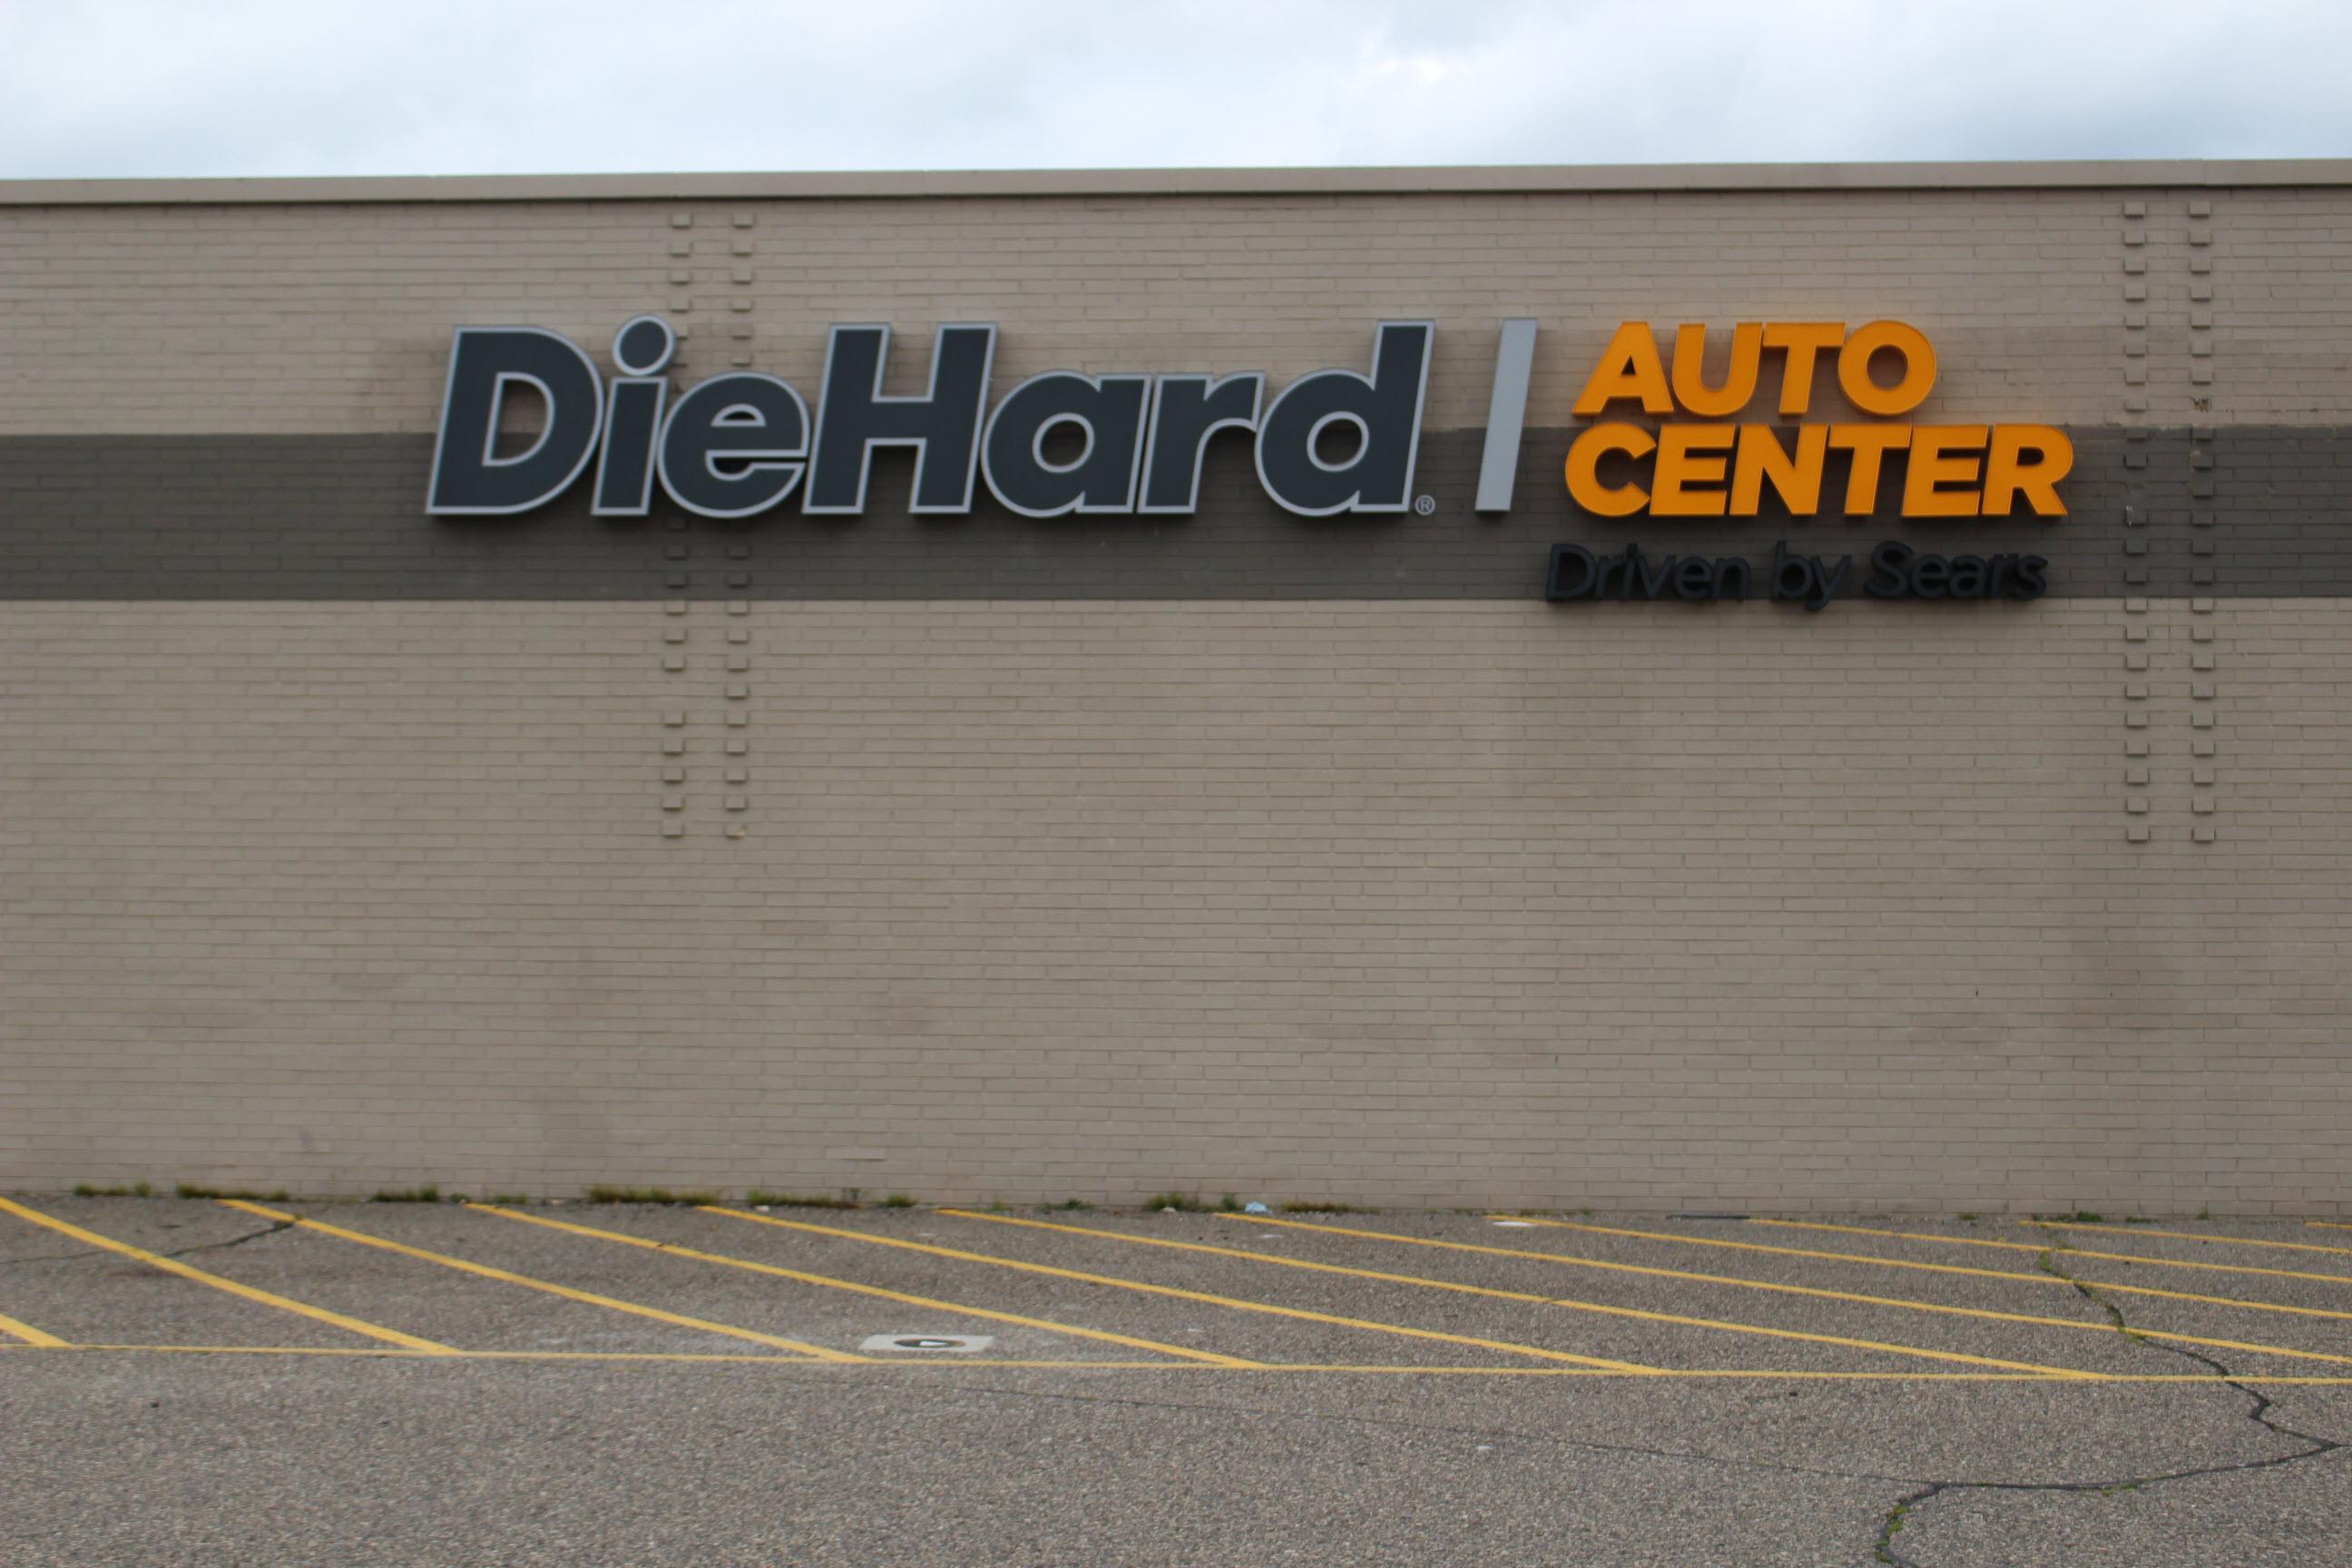 DieHard Auto Center Powered by Sears image 2